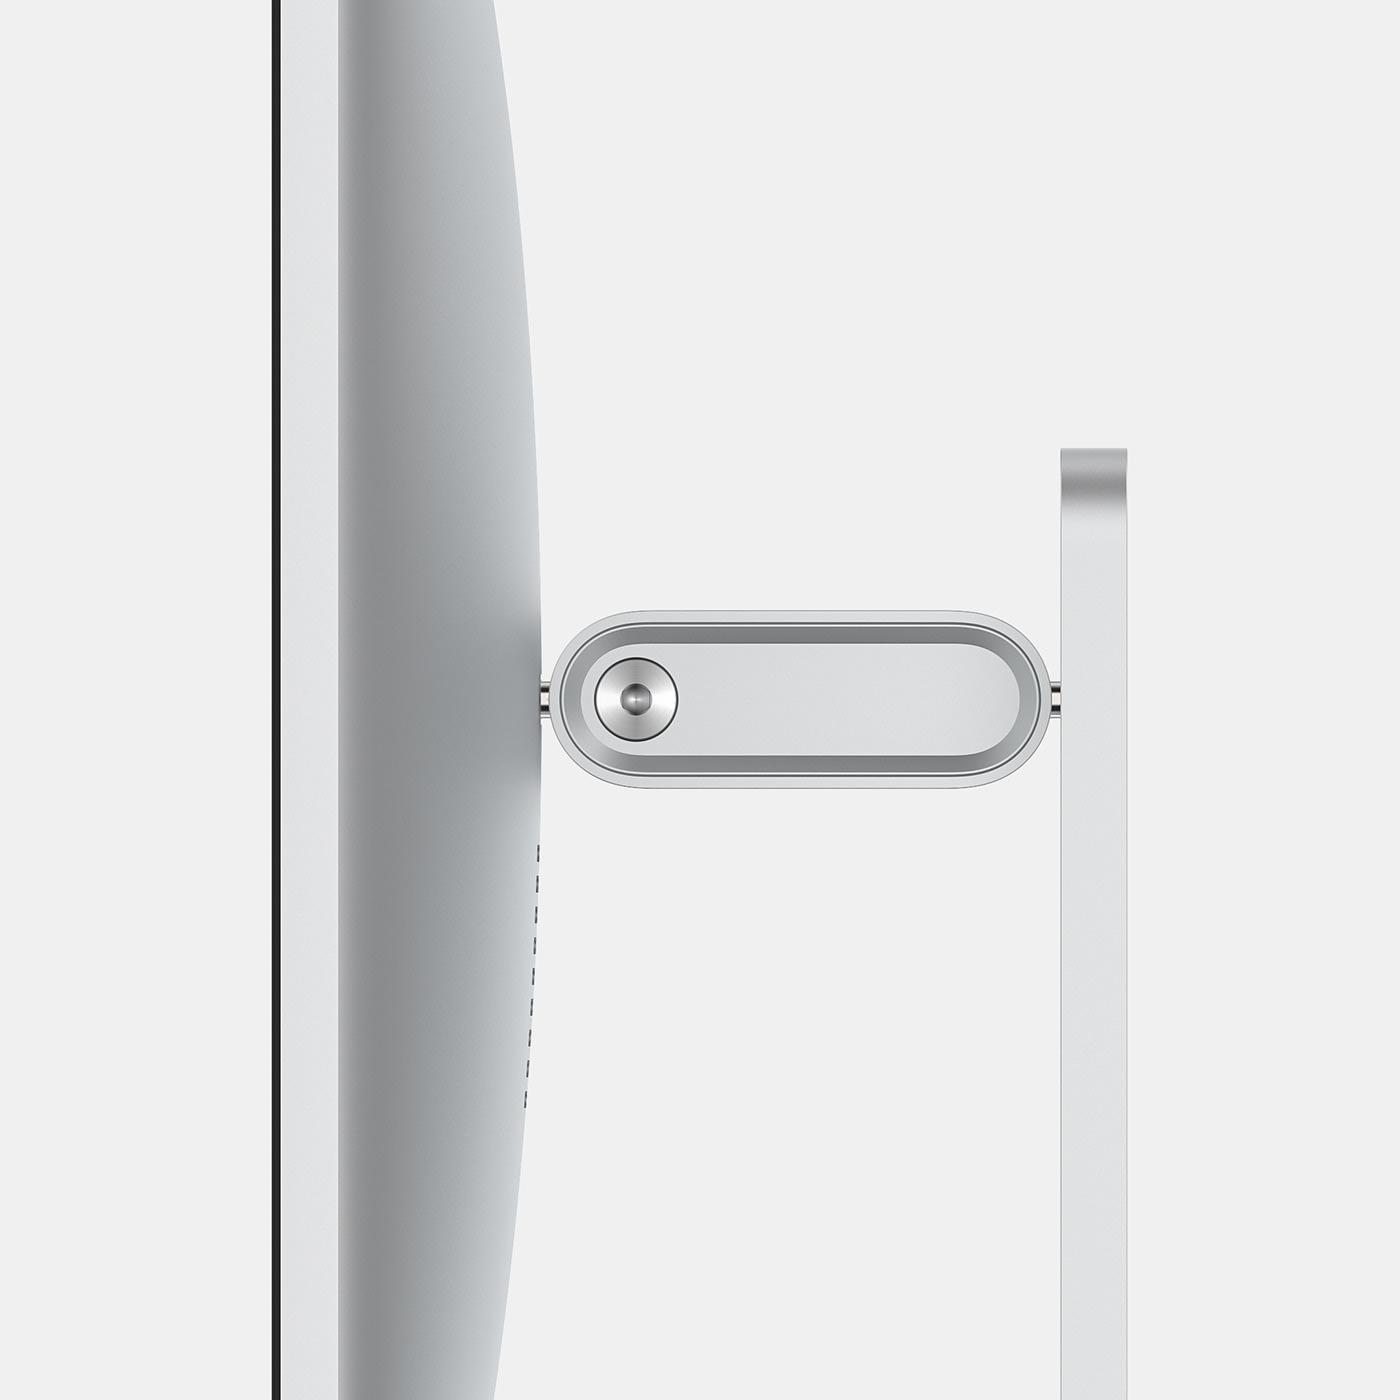 imac-concept-resembling-pro-display-xdr-16